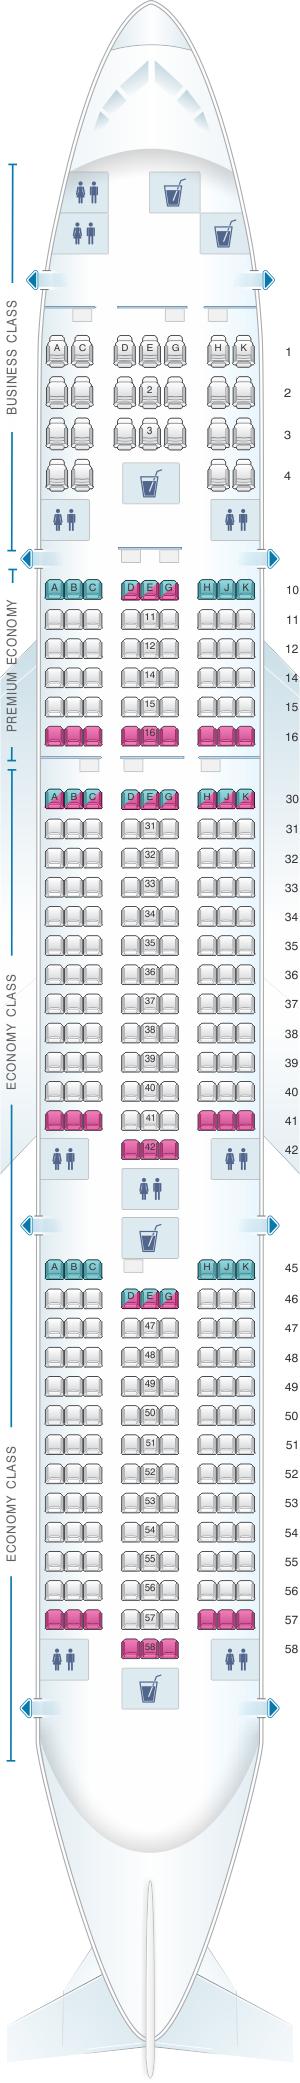 Seat map for Vietnam Airlines Boeing B777 200ER V1